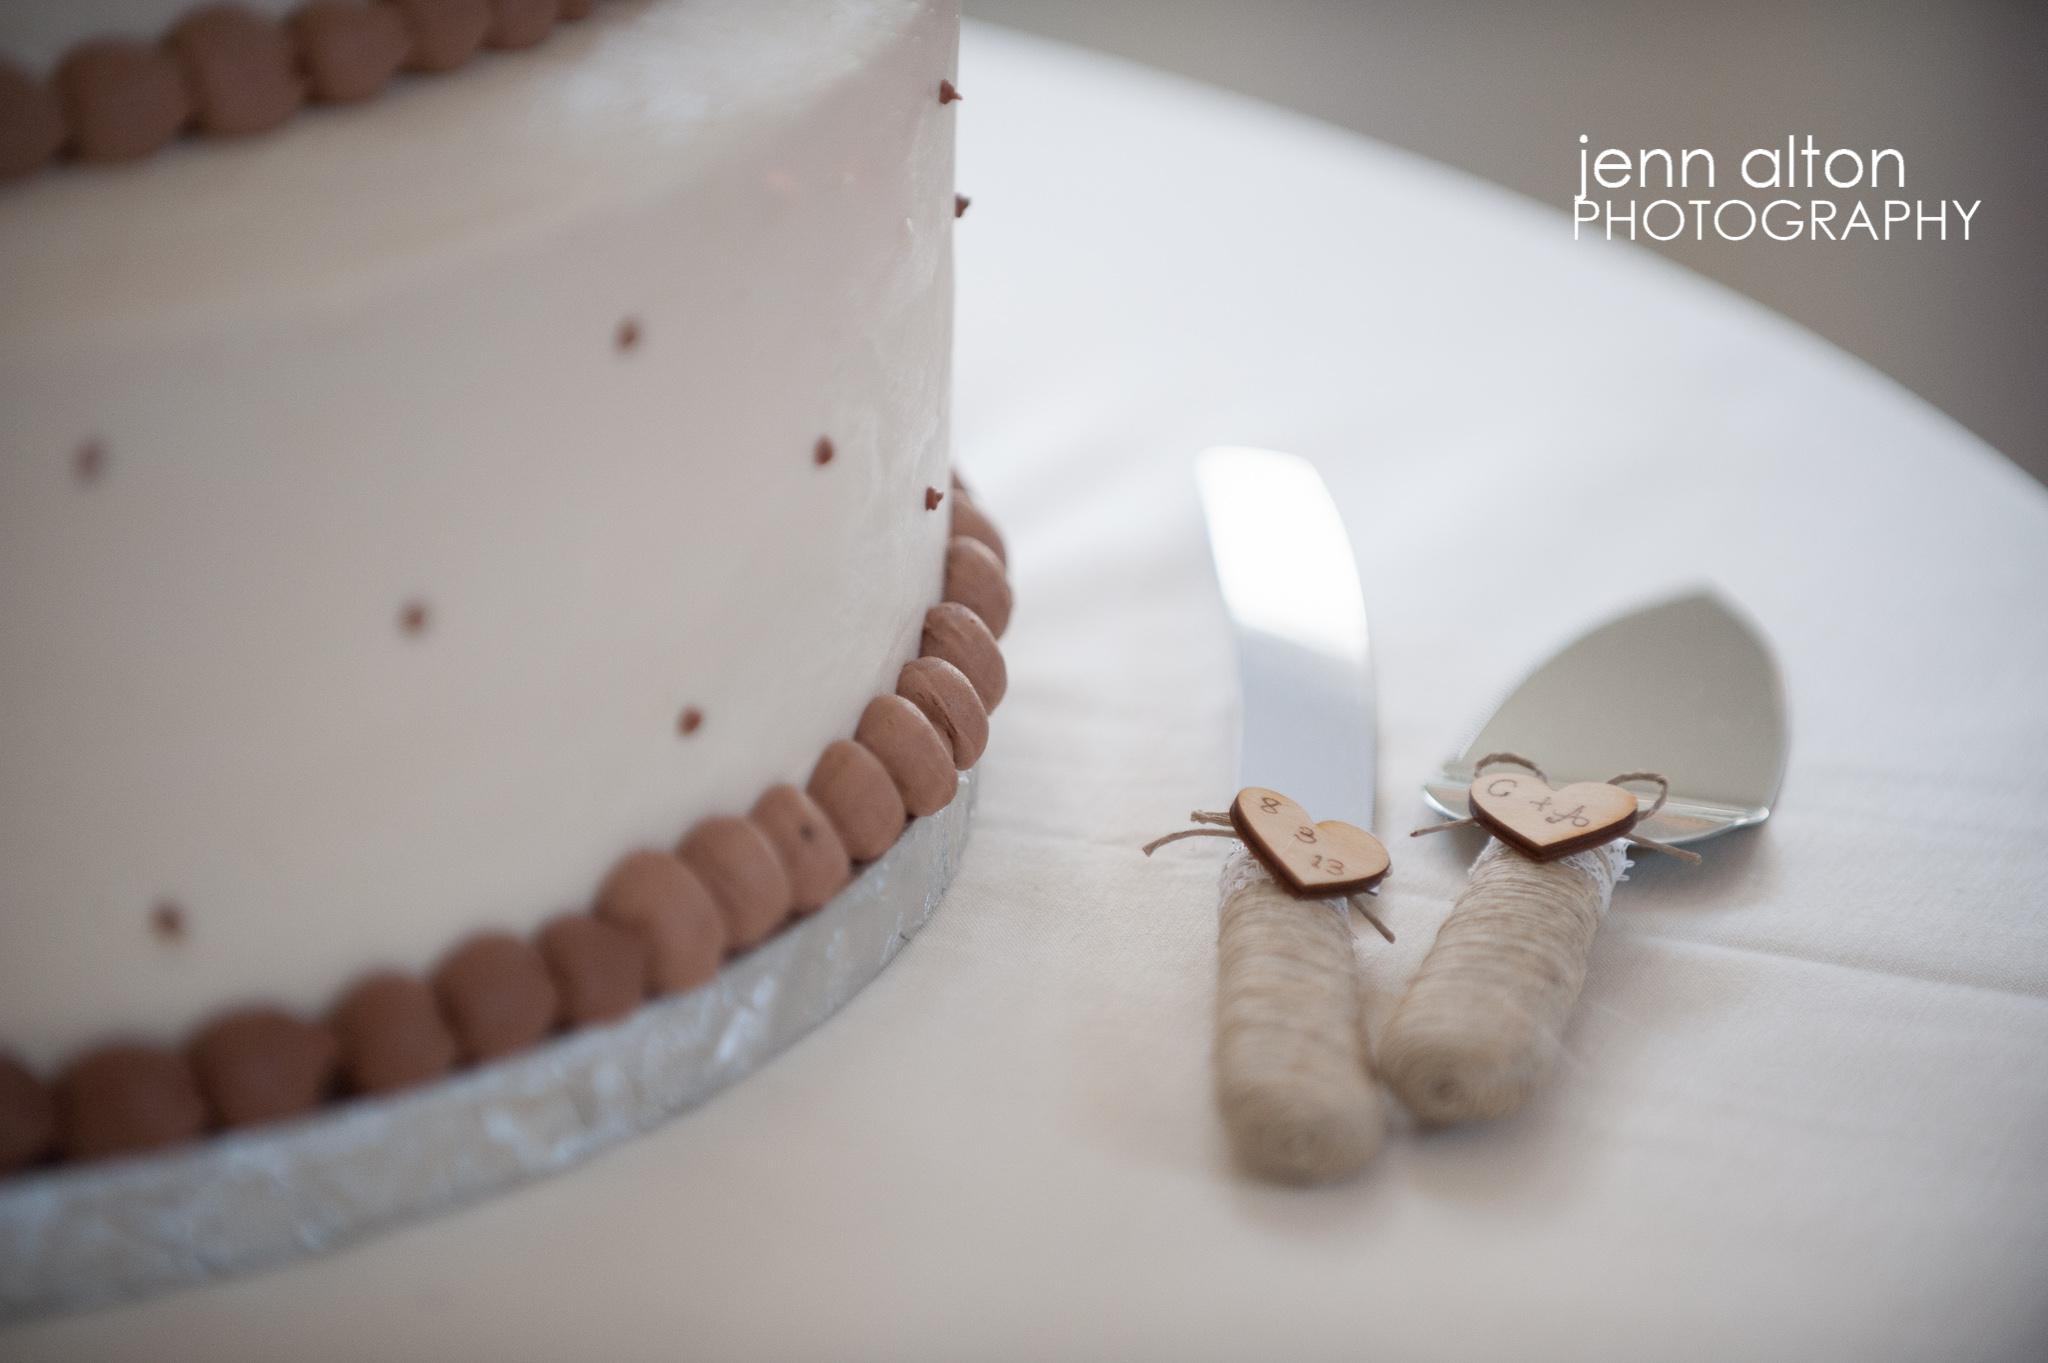 Wedding Cake and rustic cake serving set